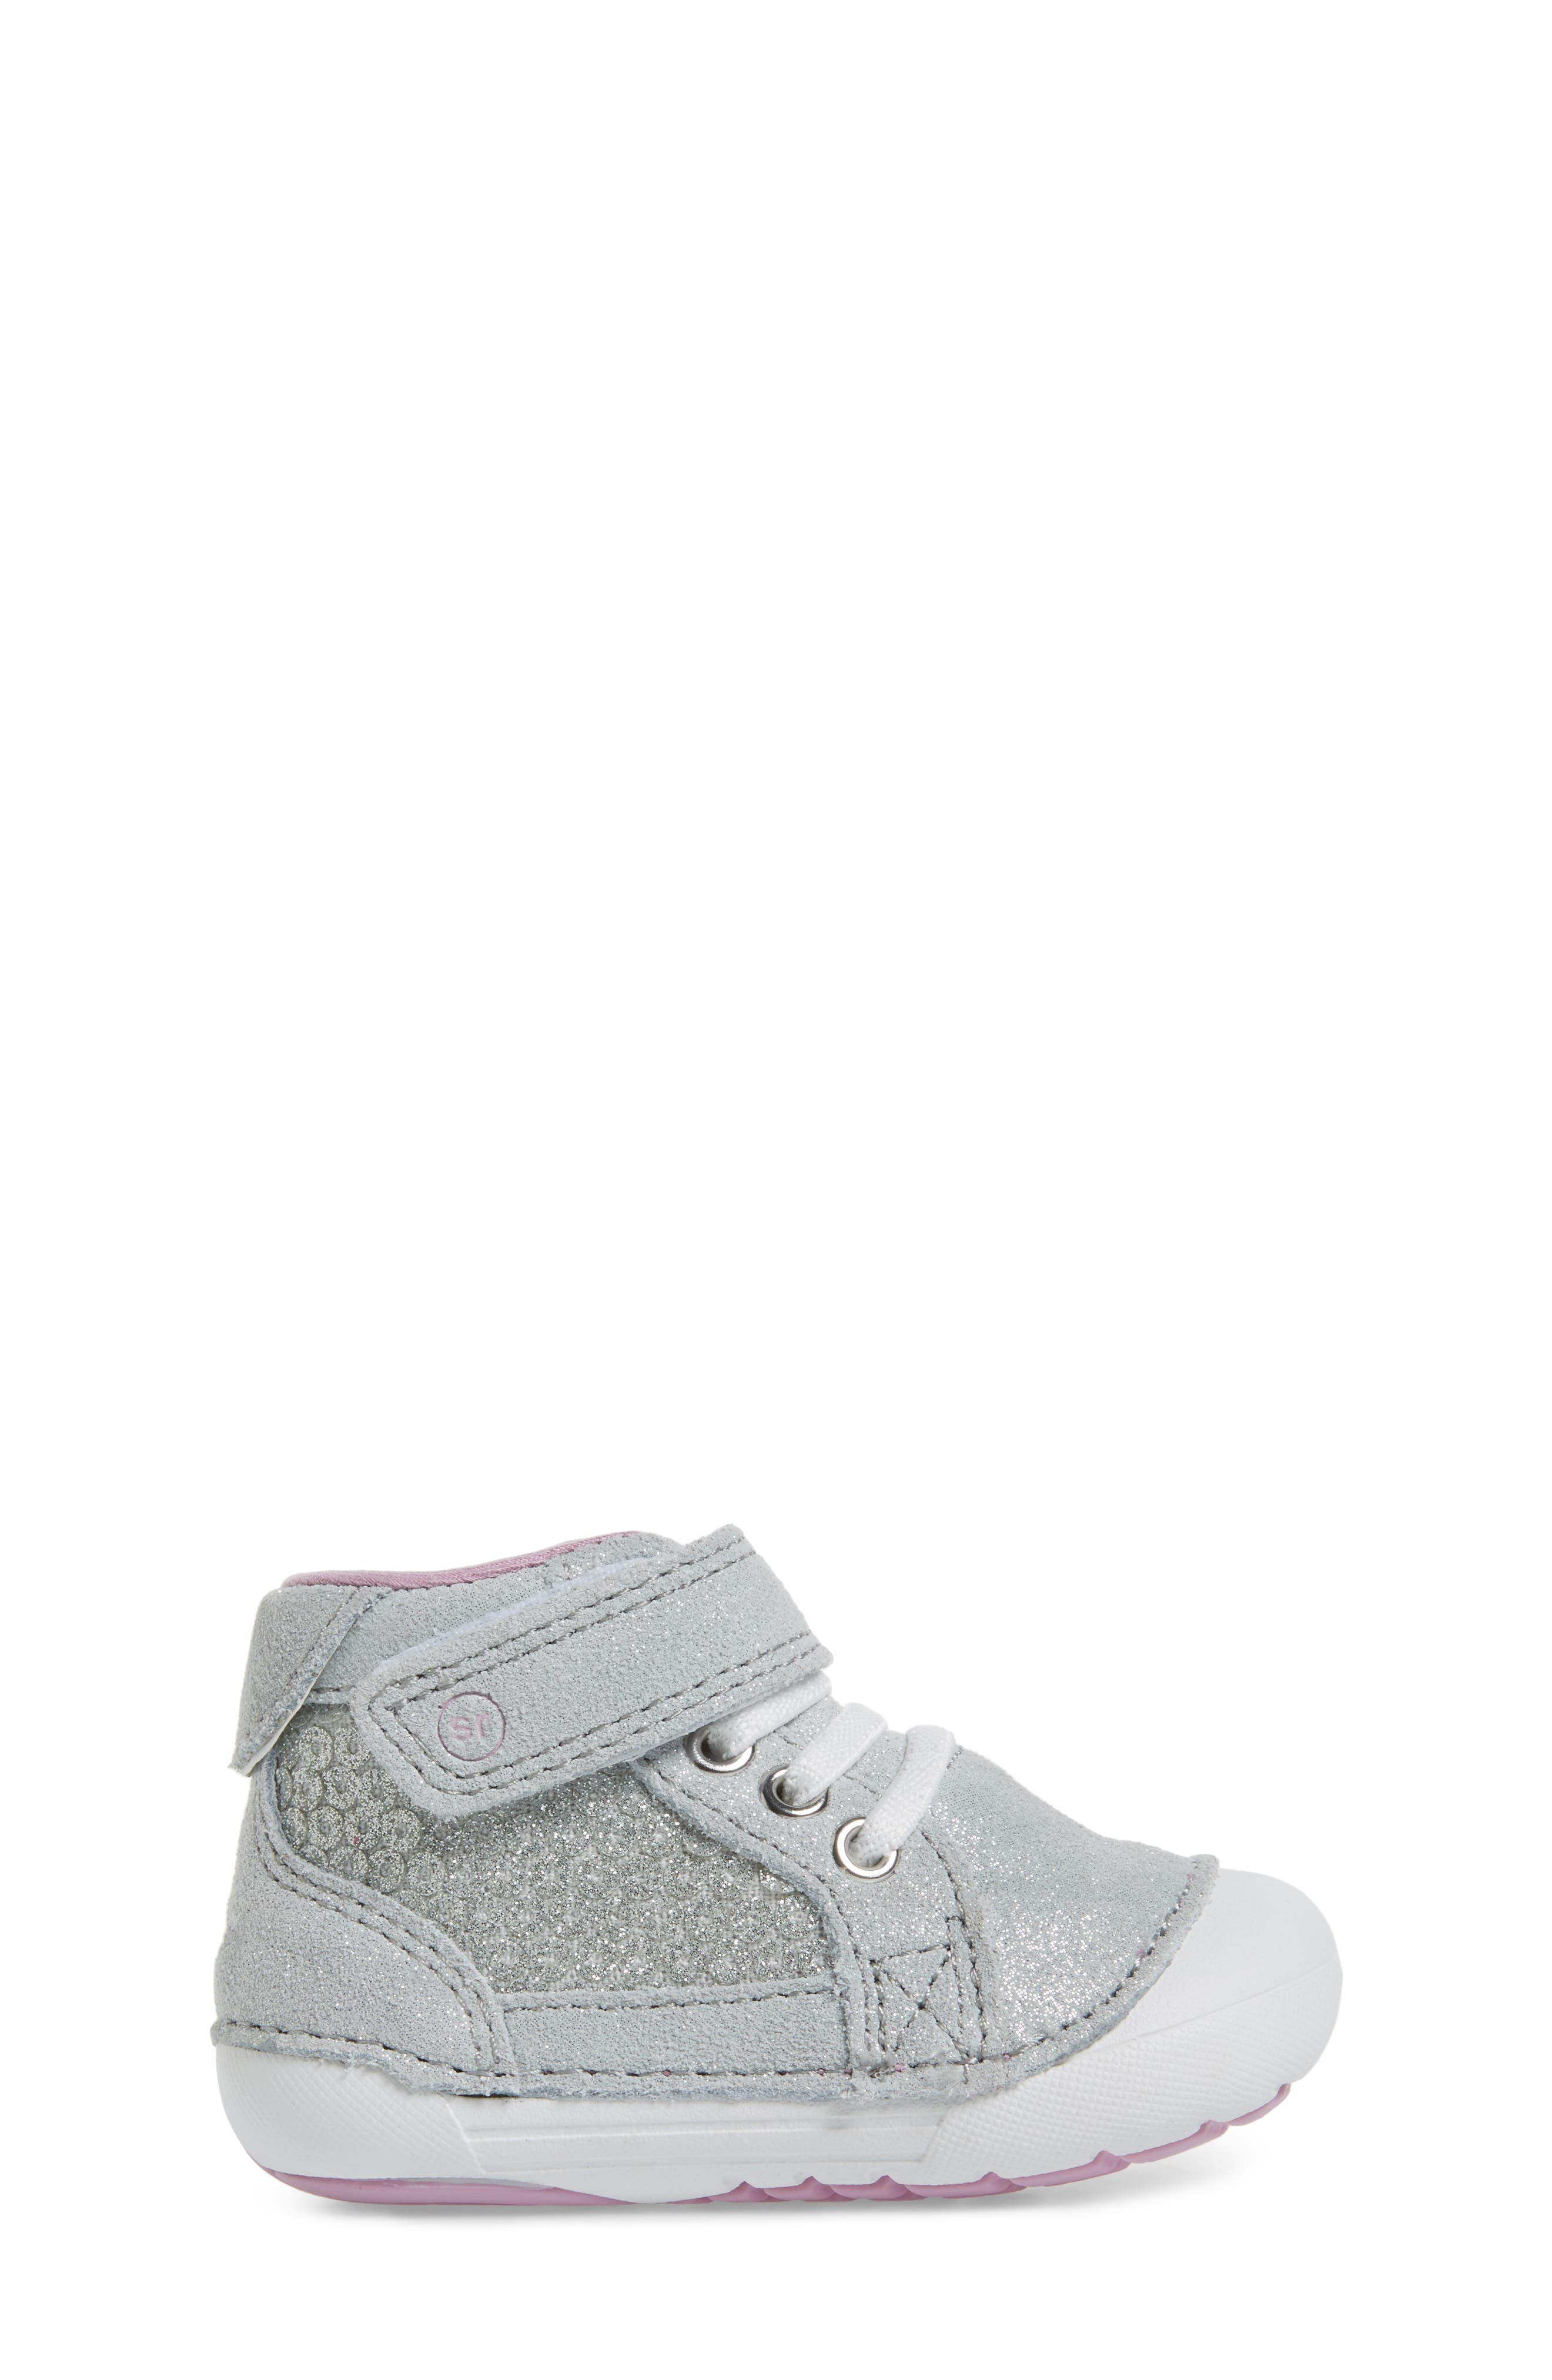 Alternate Image 3  - Stride Rite Soft Motion™ Jada High Top Sneaker (Baby & Walker)